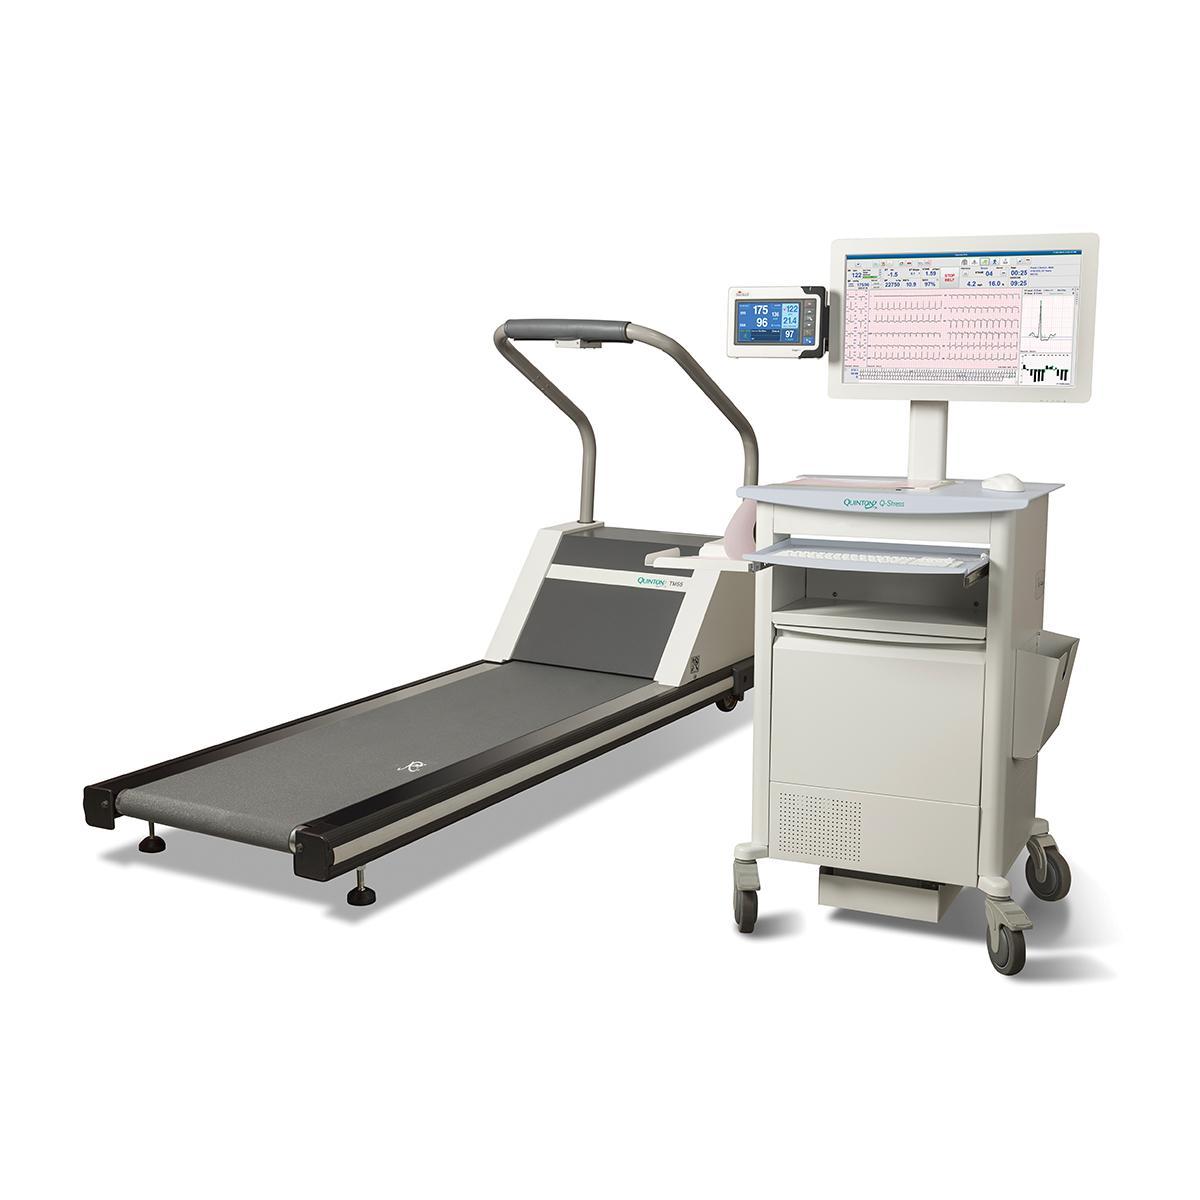 Q-Stress Cardiac Stress Testing System with treadmill, diagonal view